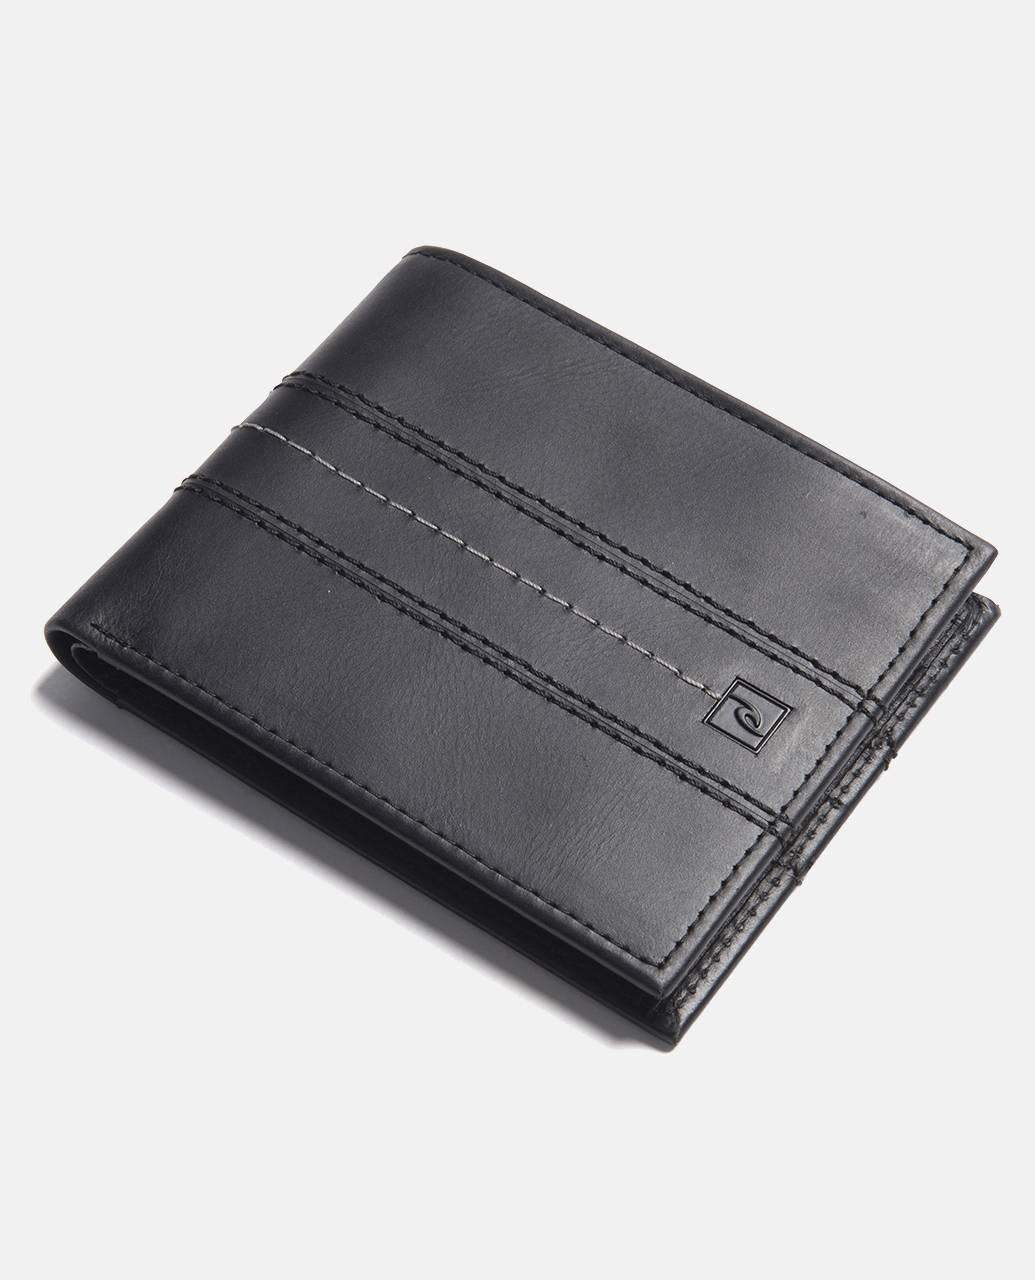 Peňaženka pánska RIP CURL STITCH ICON RFID 2 IN1